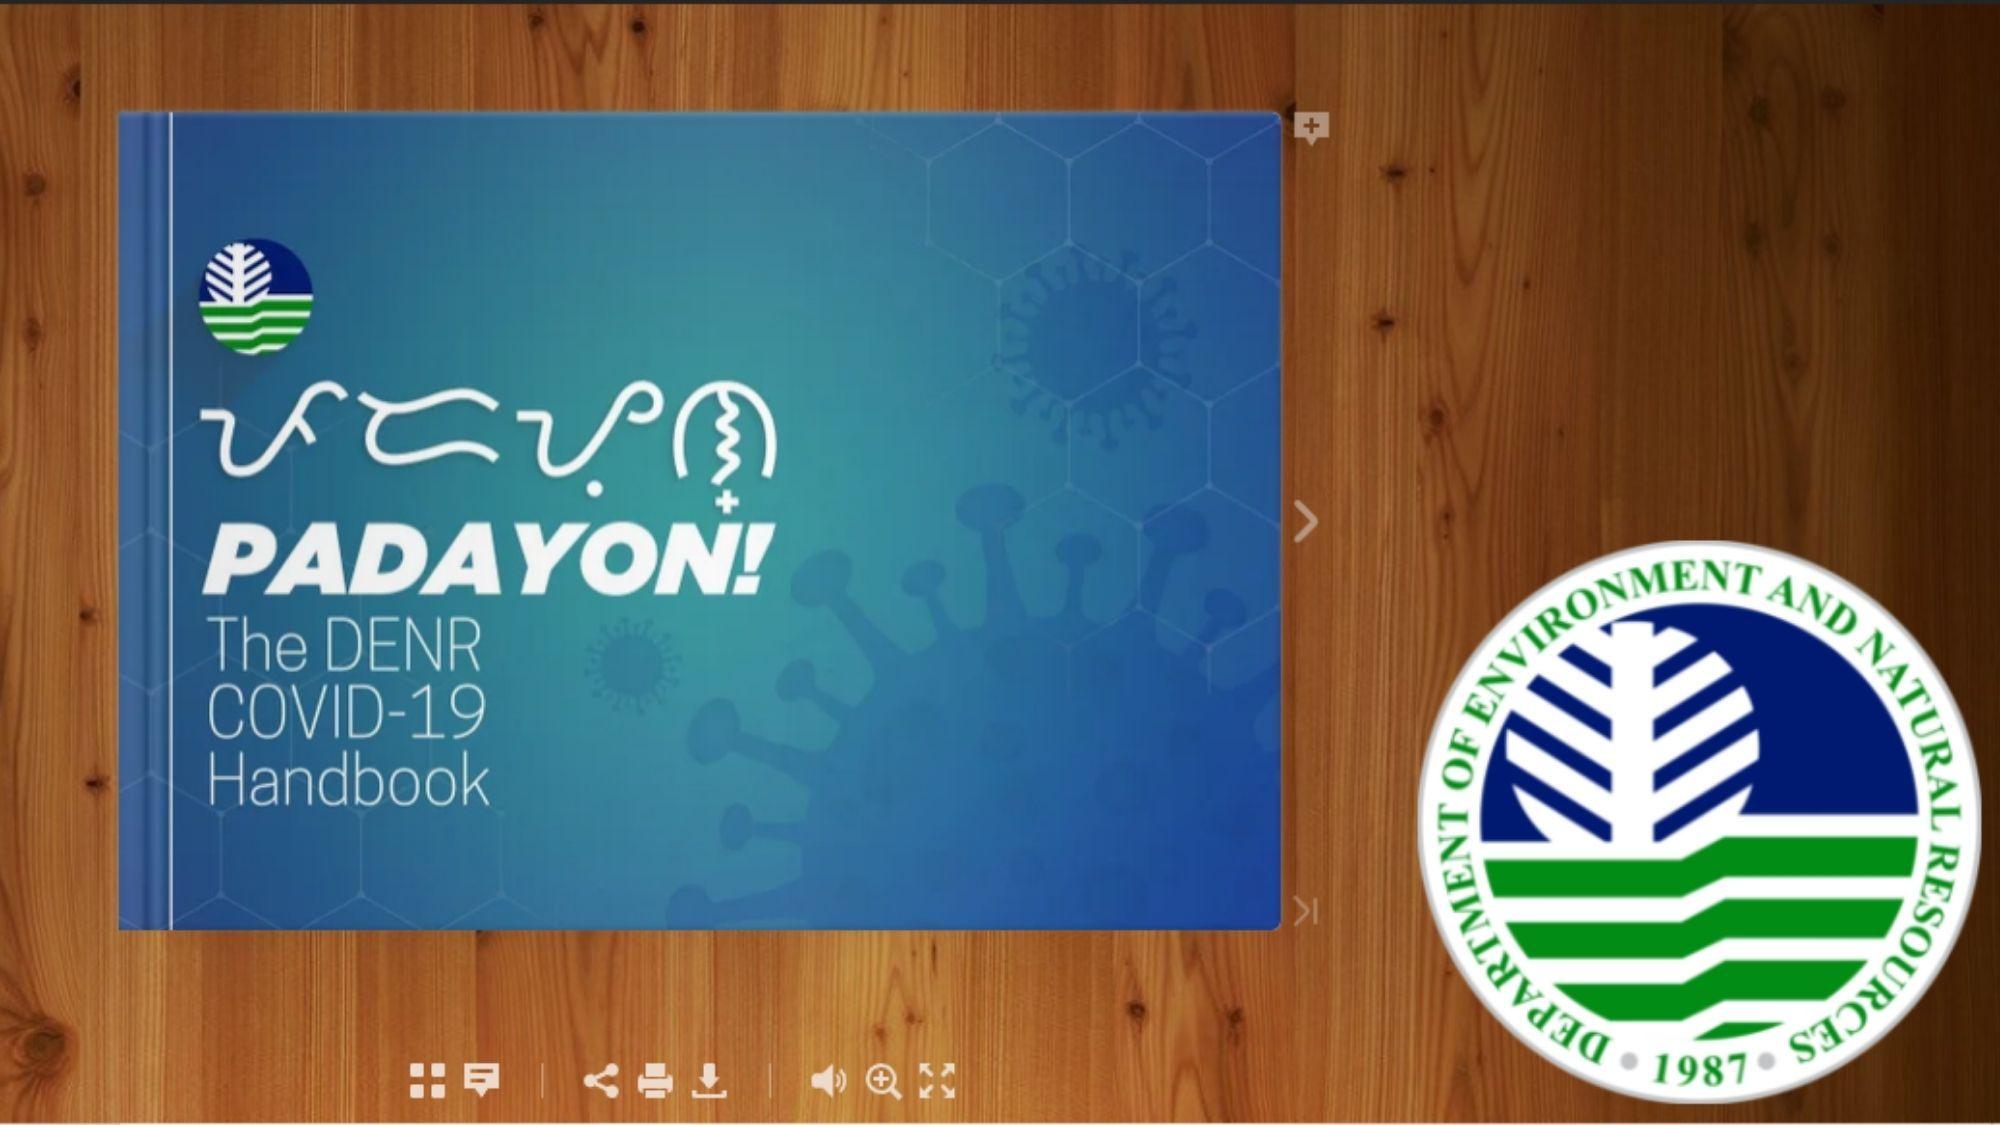 DENR launches 'Padayon' Covid-19 handbook photo DENR